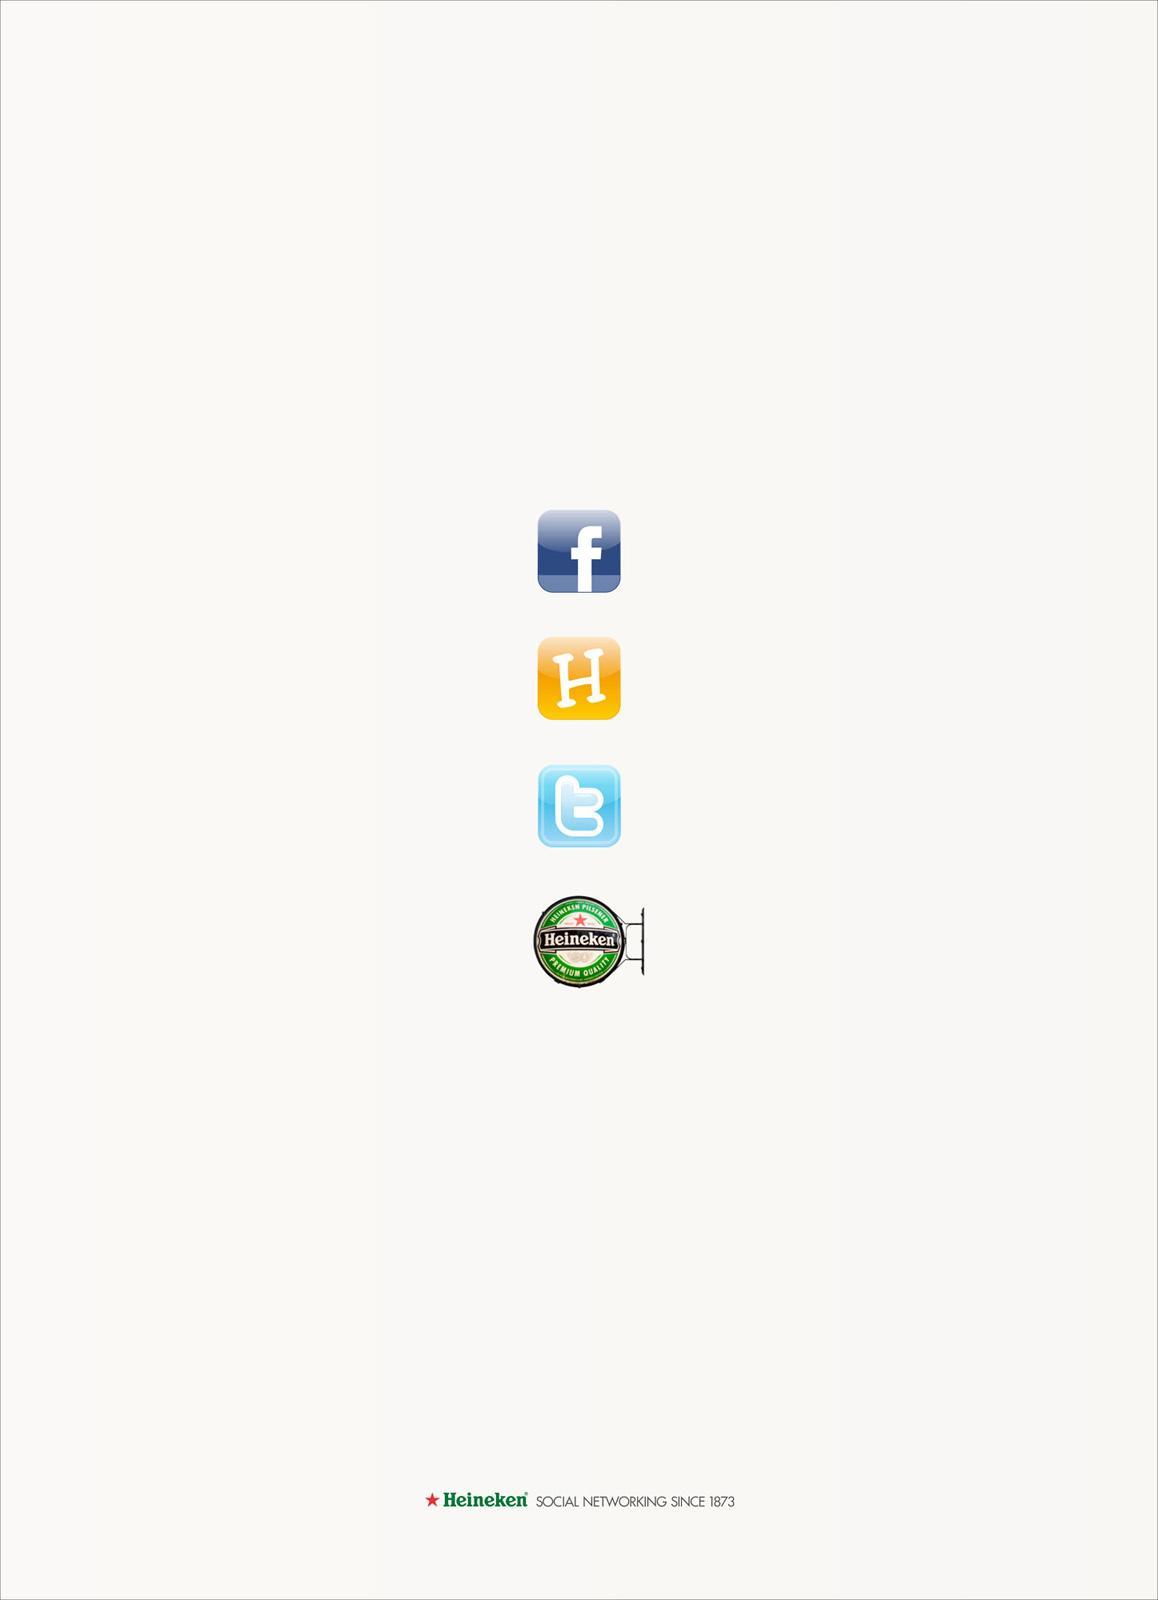 Heineken Print Ad -  Social Networking since 1873